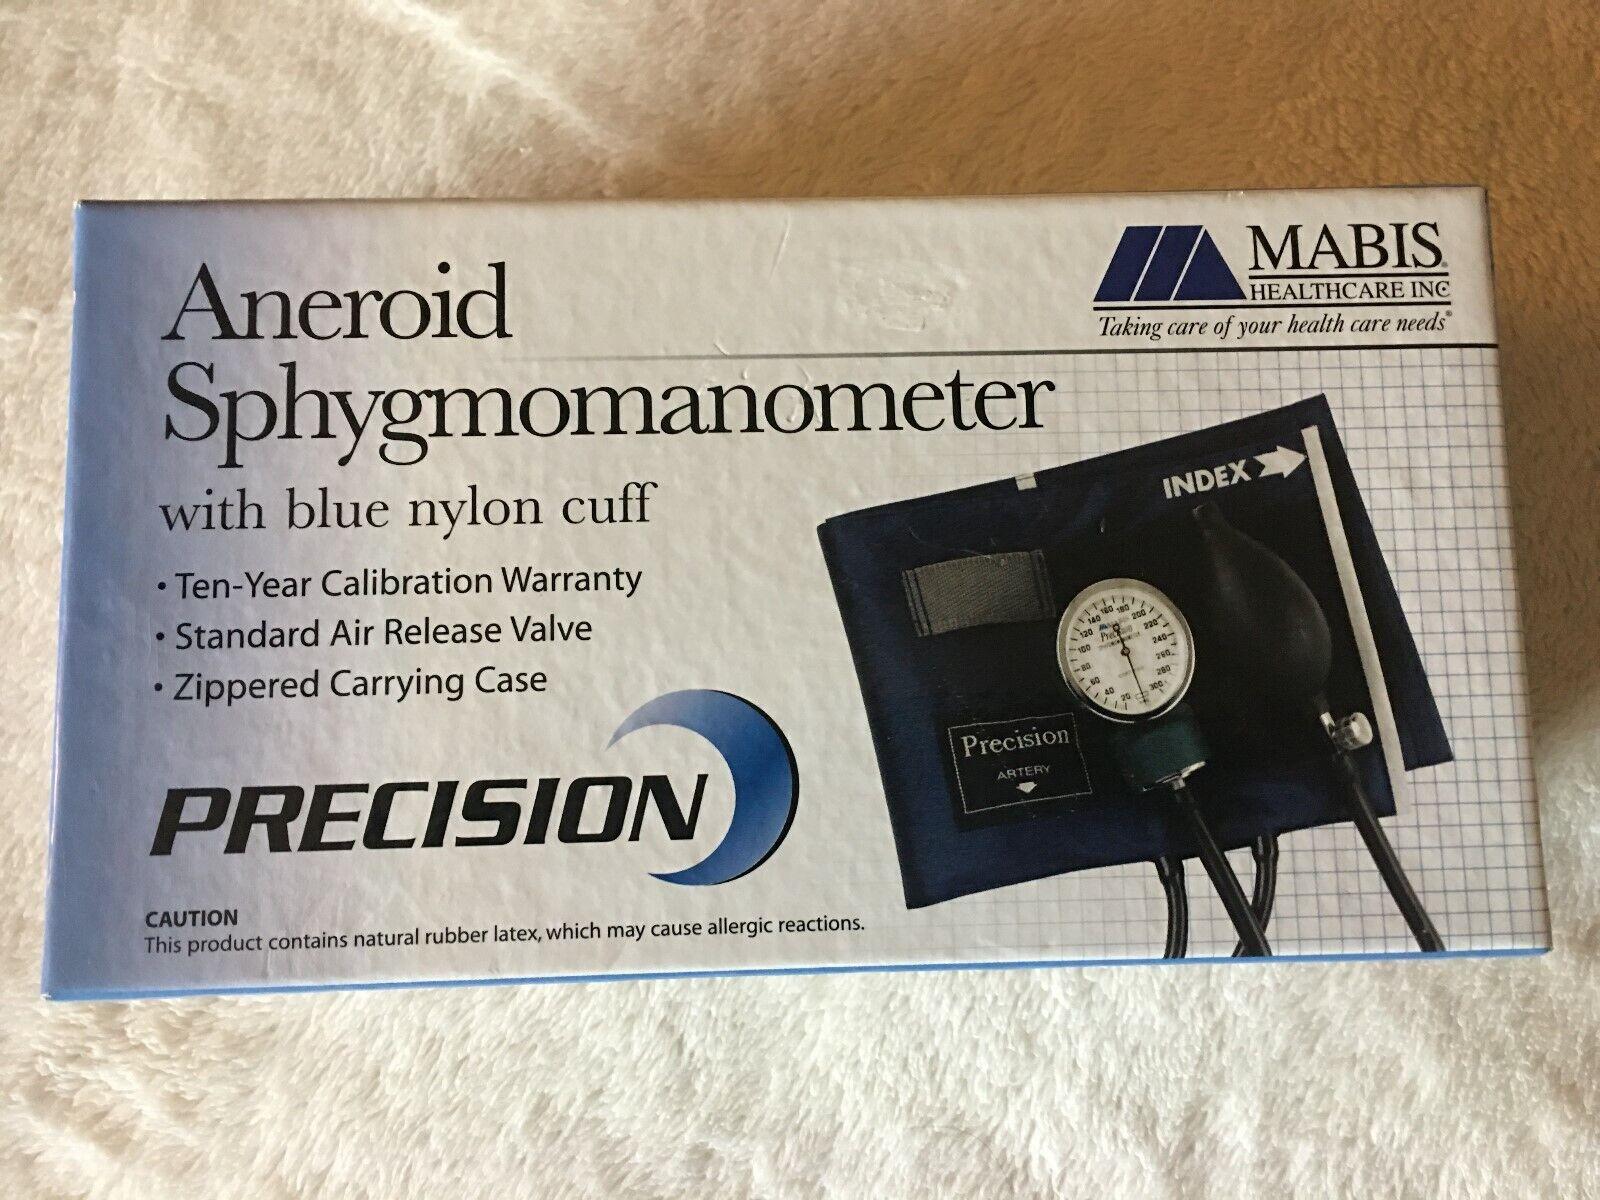 PrecisionTM Series Aneroid Sphygmamanometer